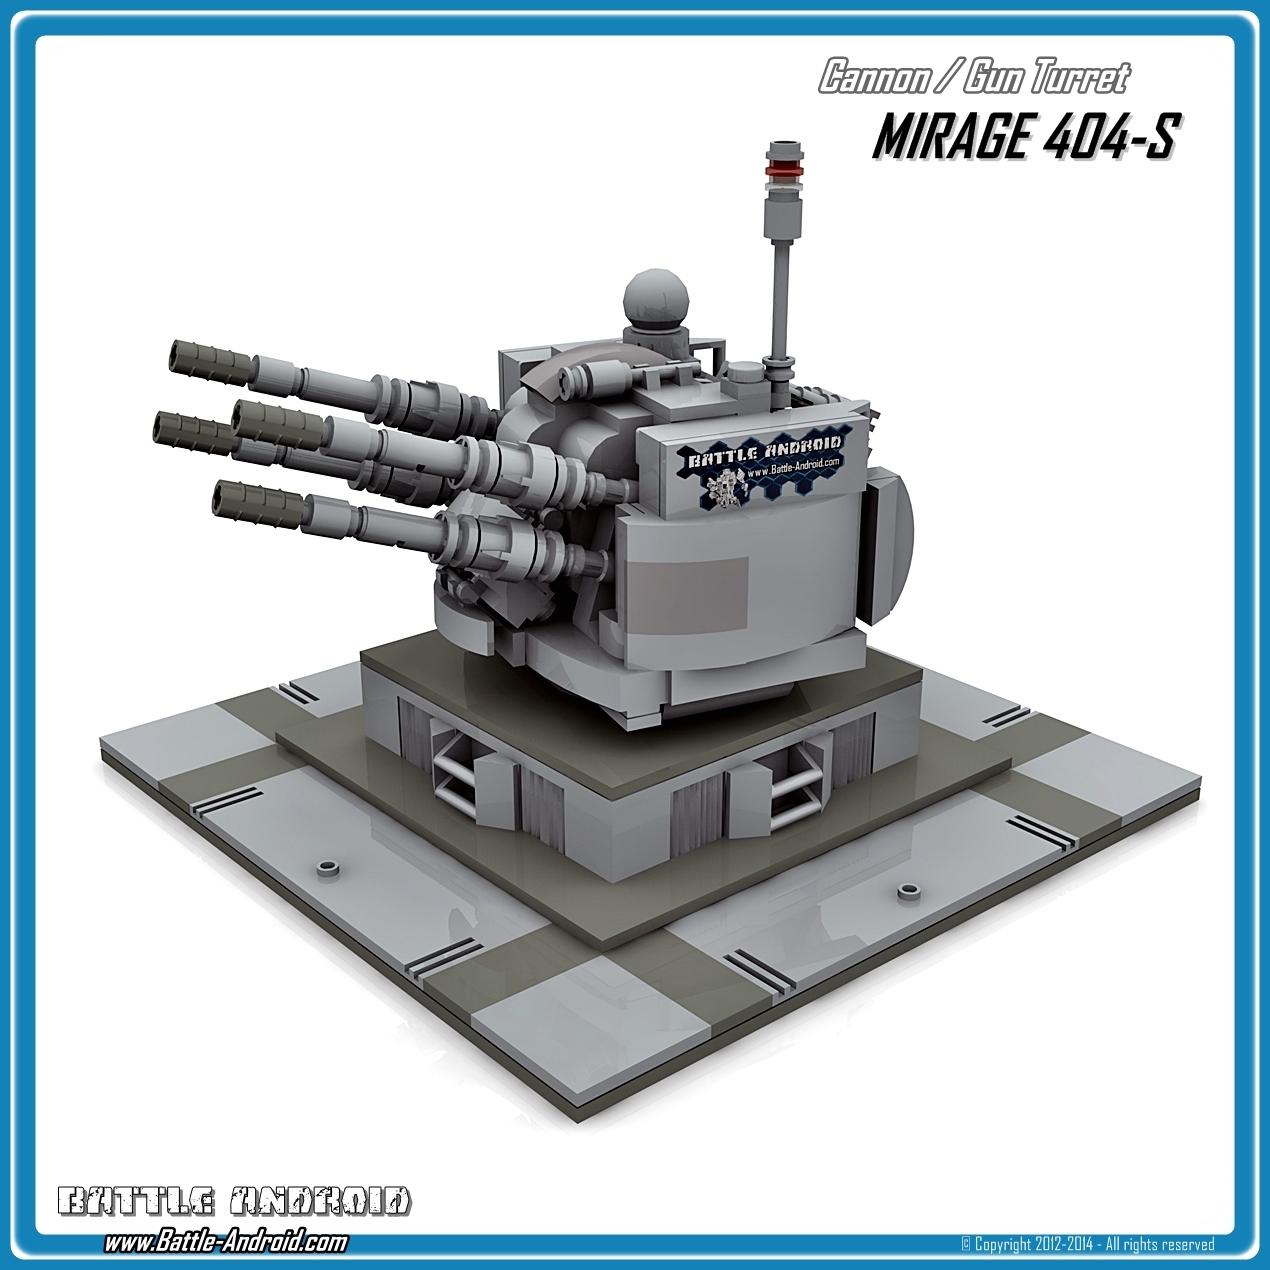 Custom Pdf Building Instructions Mirage 404s Grey For Lego Bricks